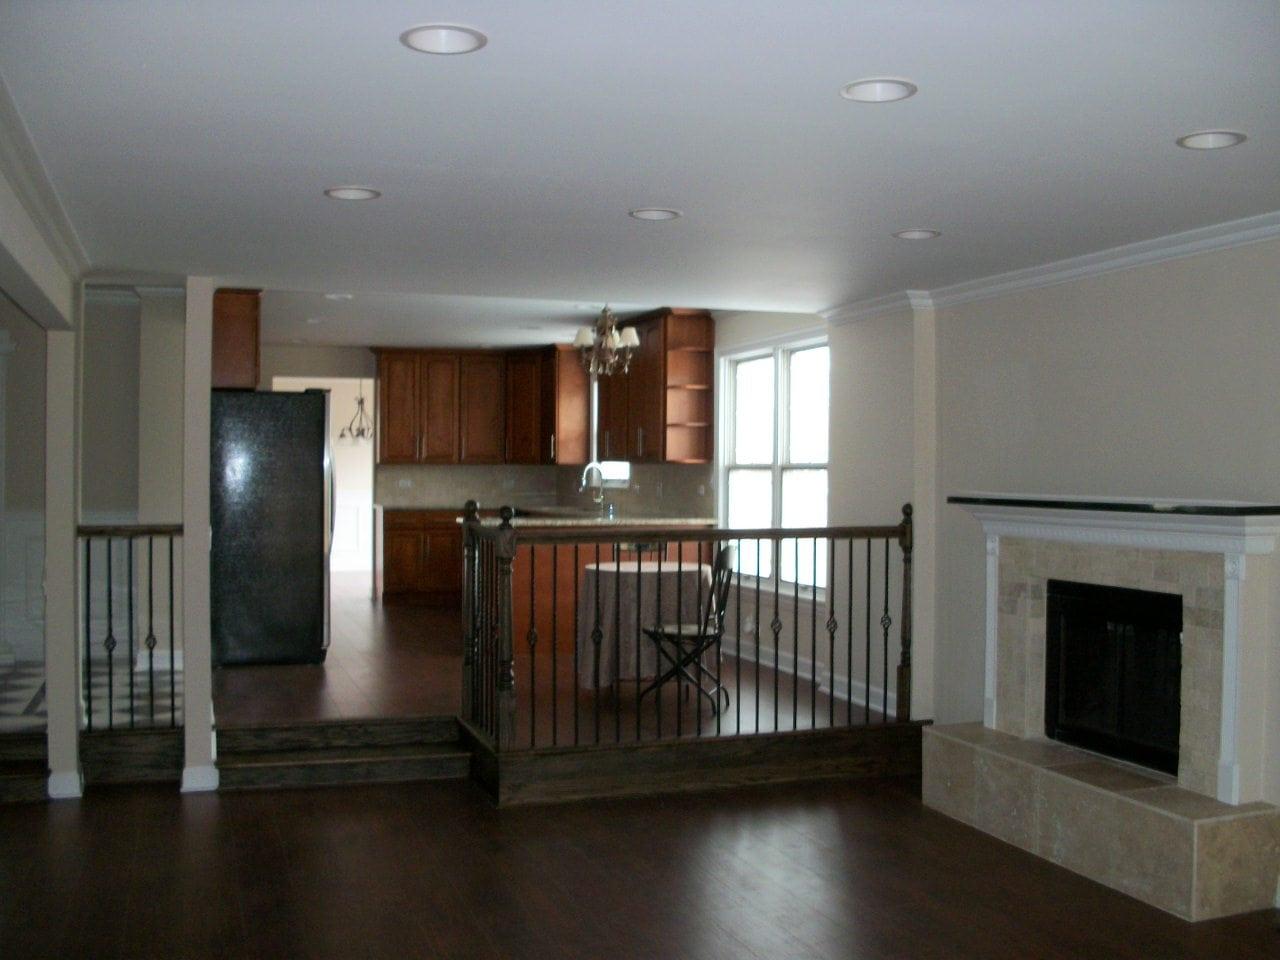 Mount Prospect - after - kitchen